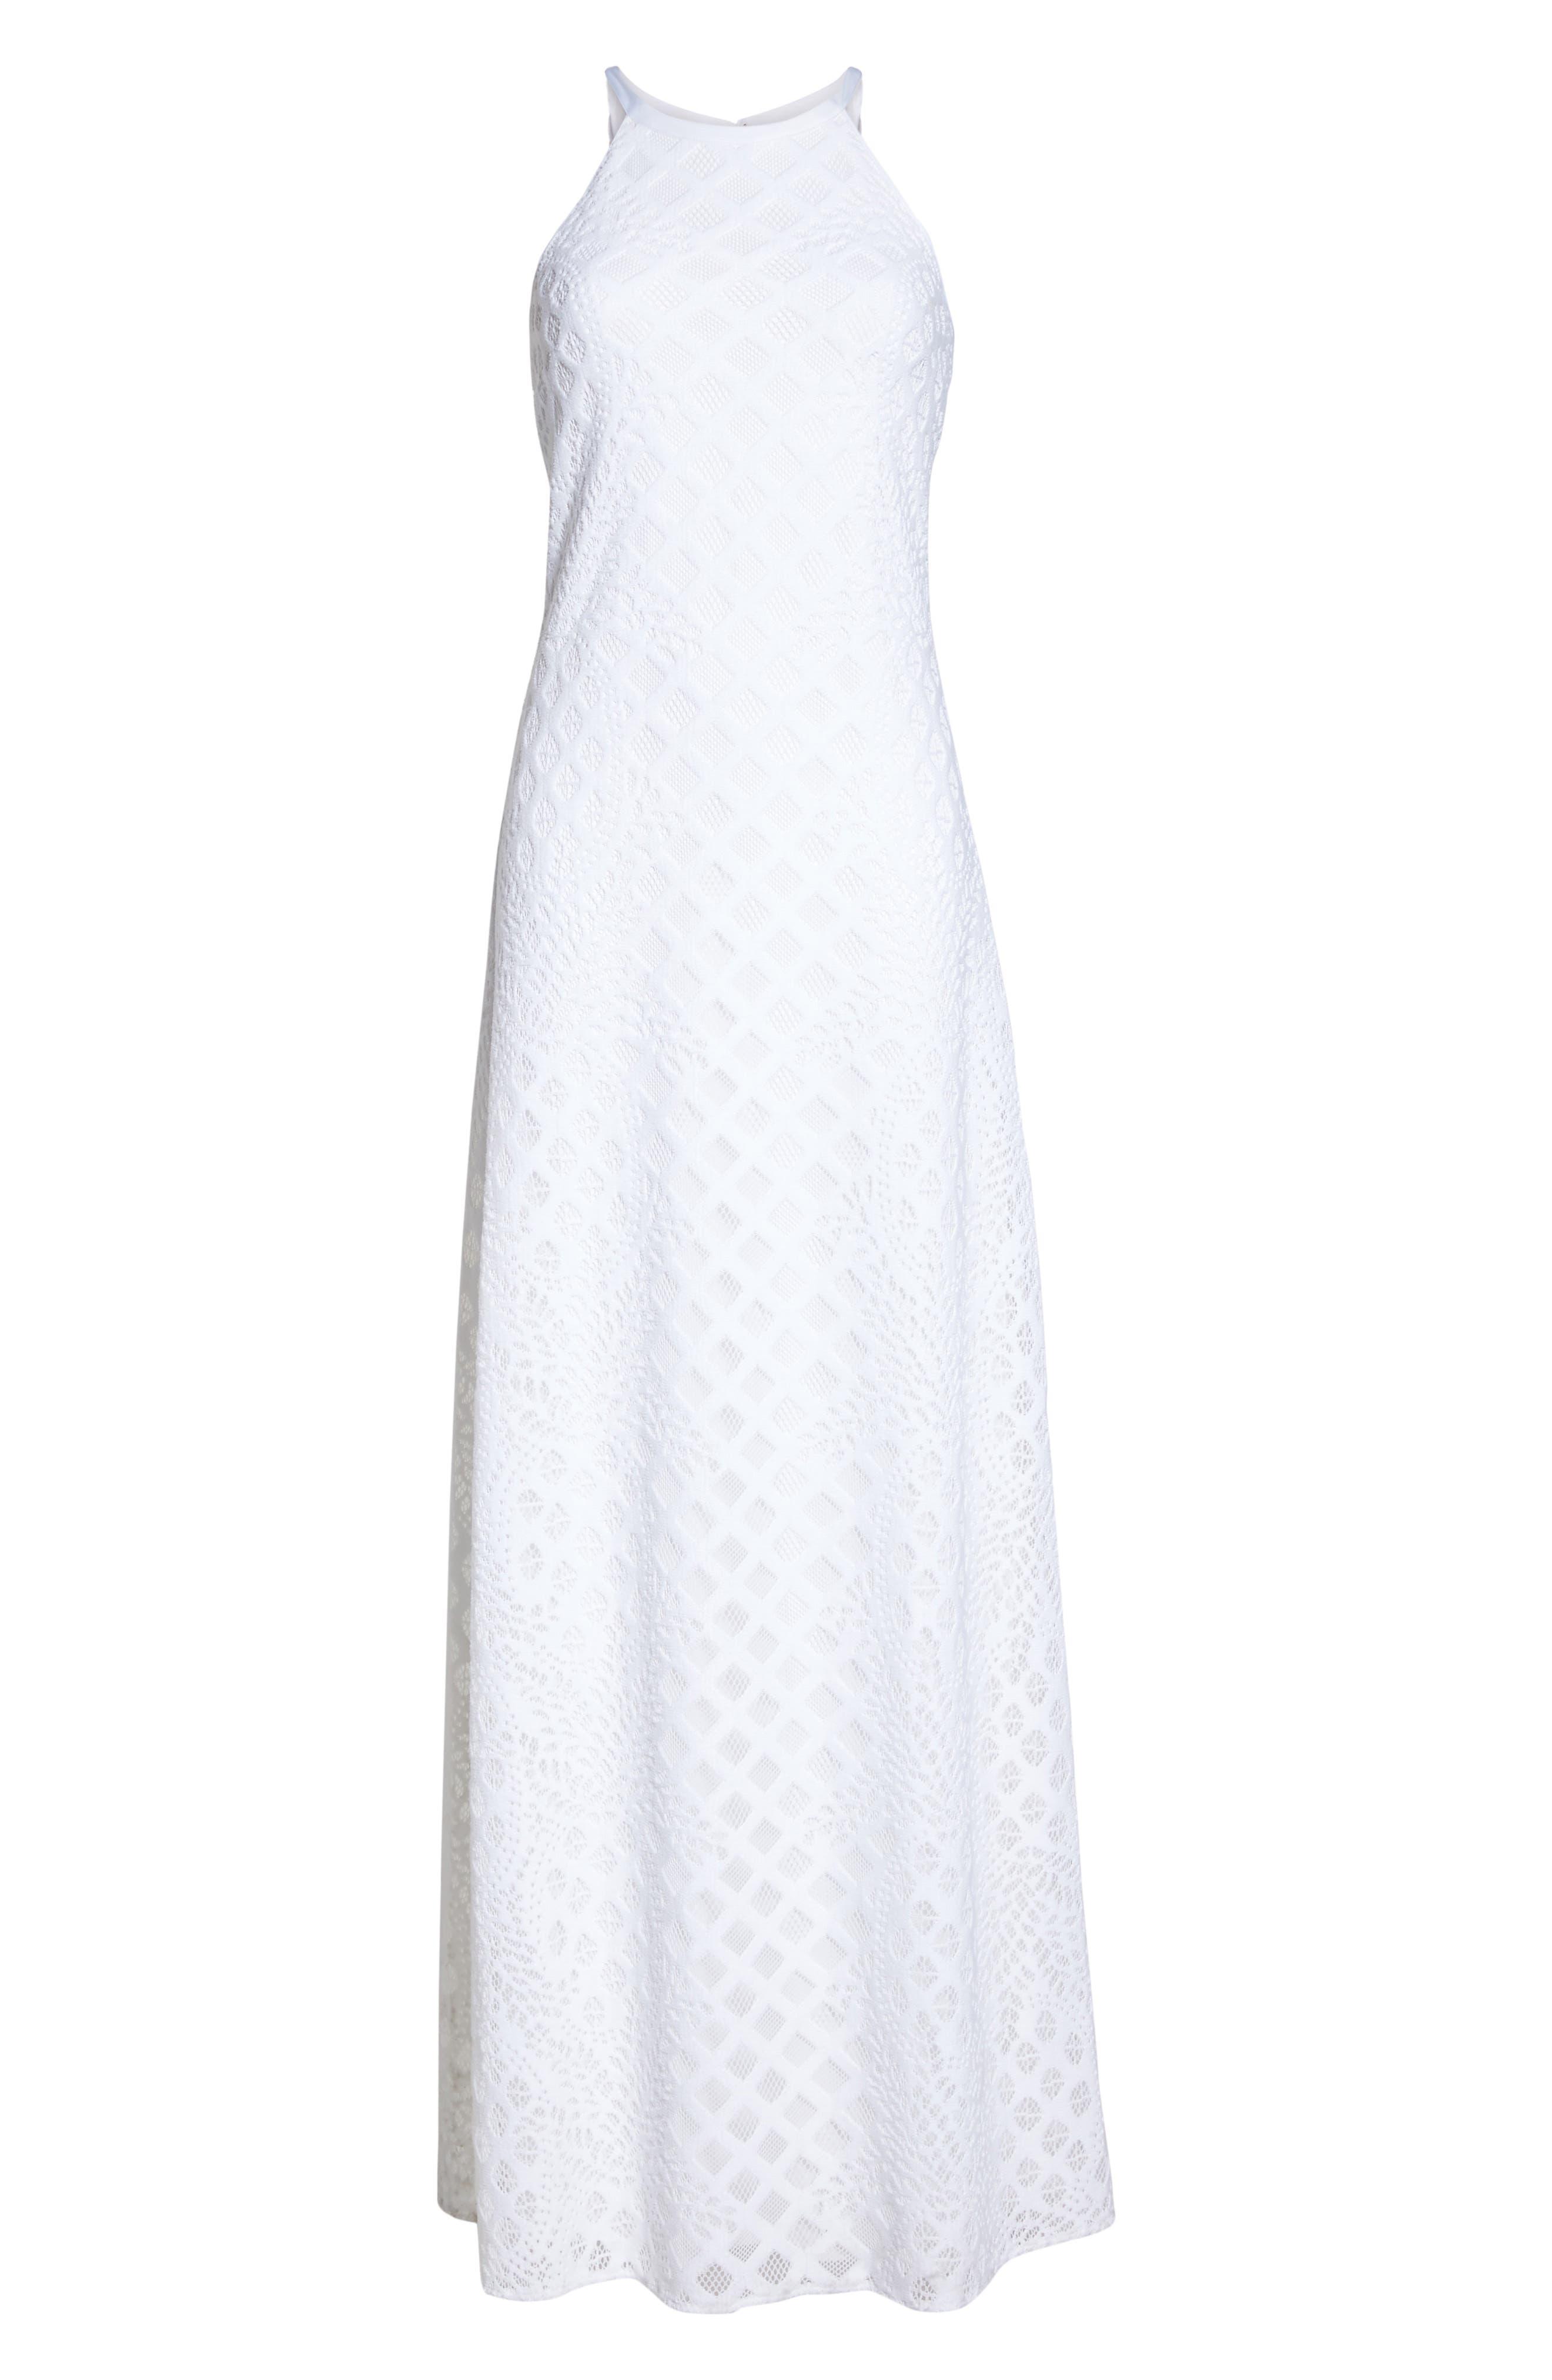 Pearl Maxi Dress,                             Alternate thumbnail 6, color,                             100